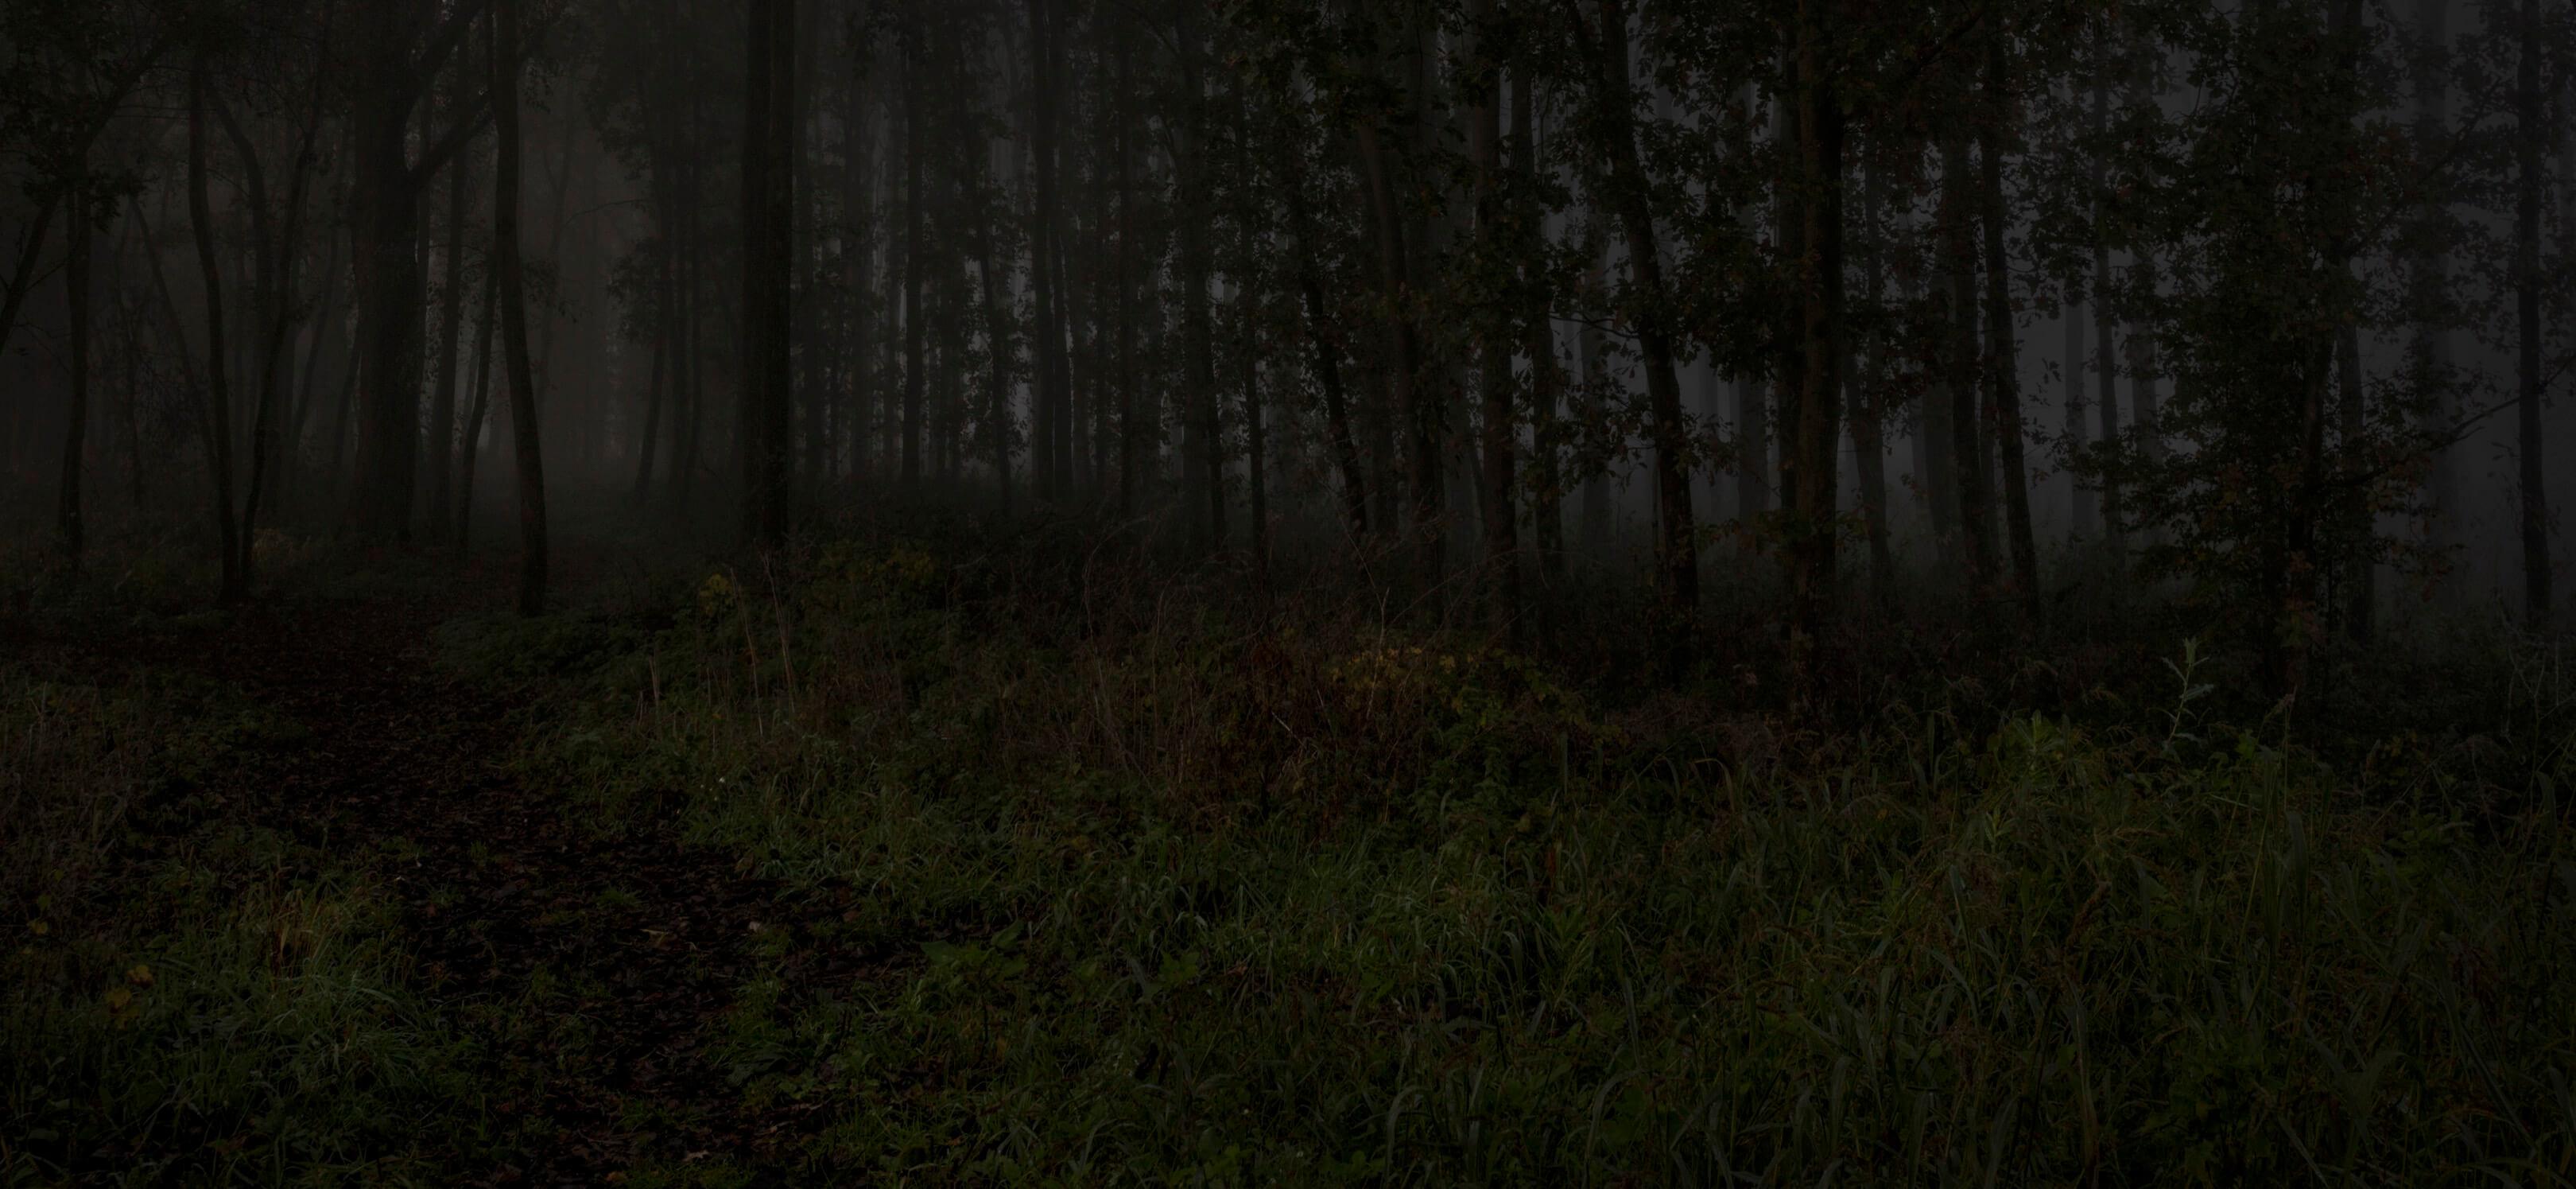 Jur Jurjen Poeles fotografie fragment landschap from dusk till dawn duister ochtendgloren dageraad vrijwerk vrij werk kunst kunstfotografie mistig bos